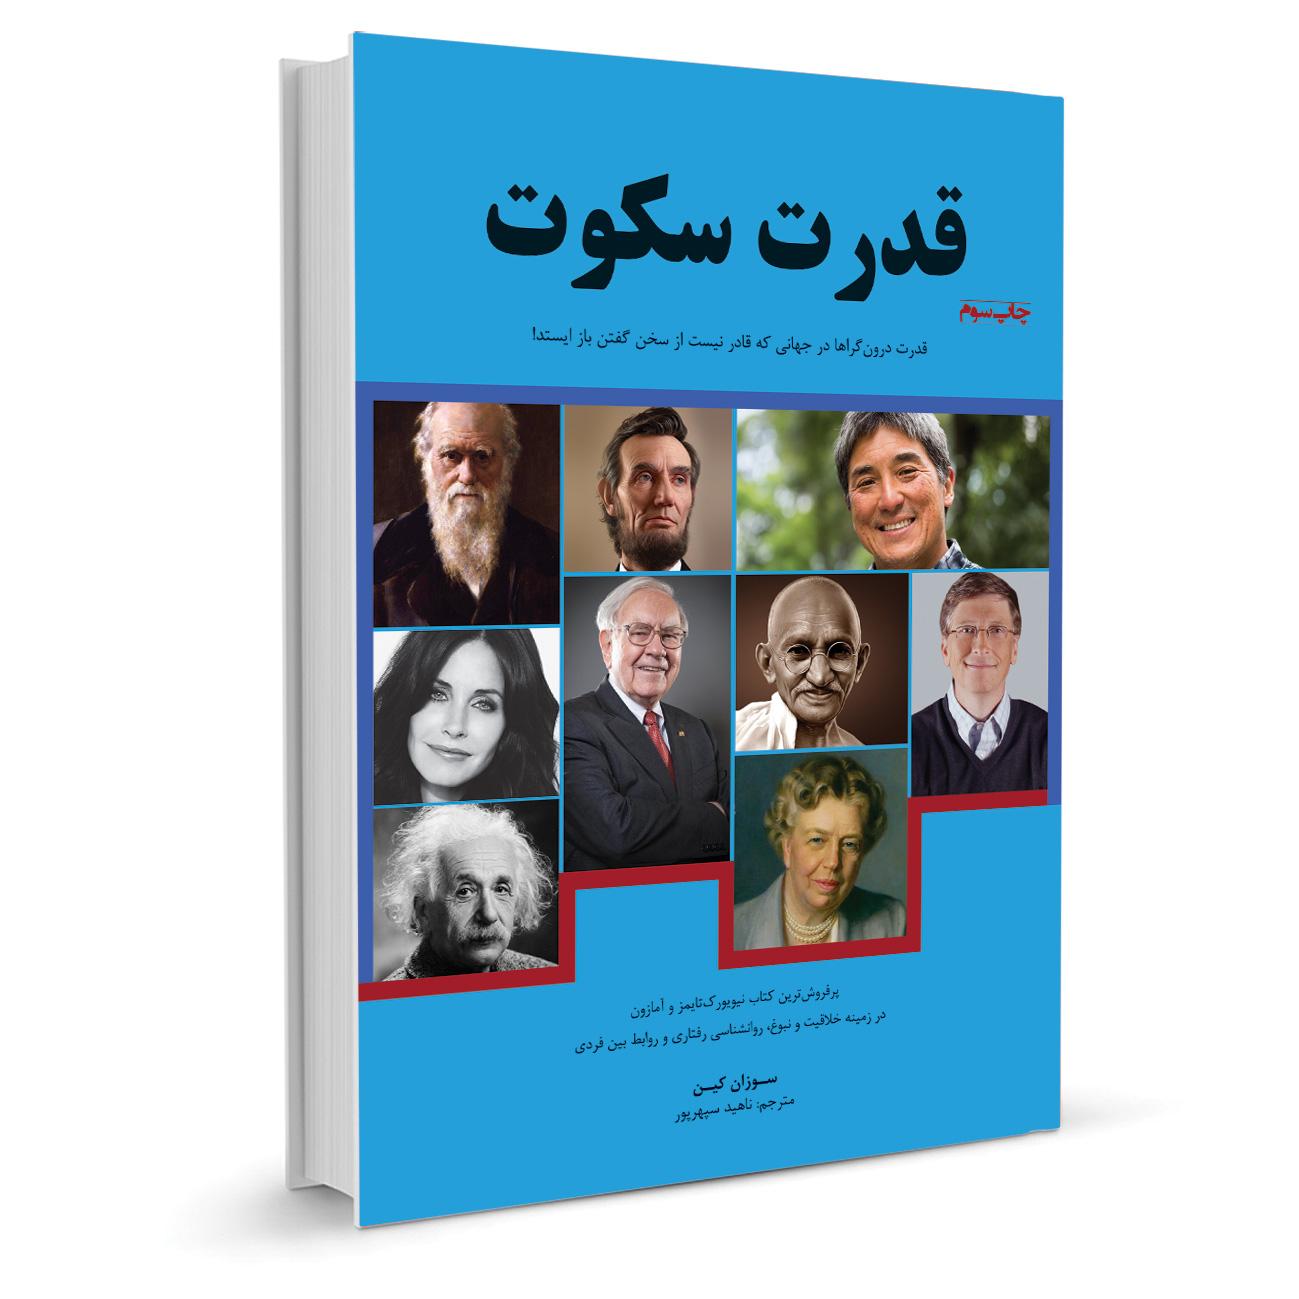 کتاب قدرت سکوت اثر سوزان کین نشر نوین